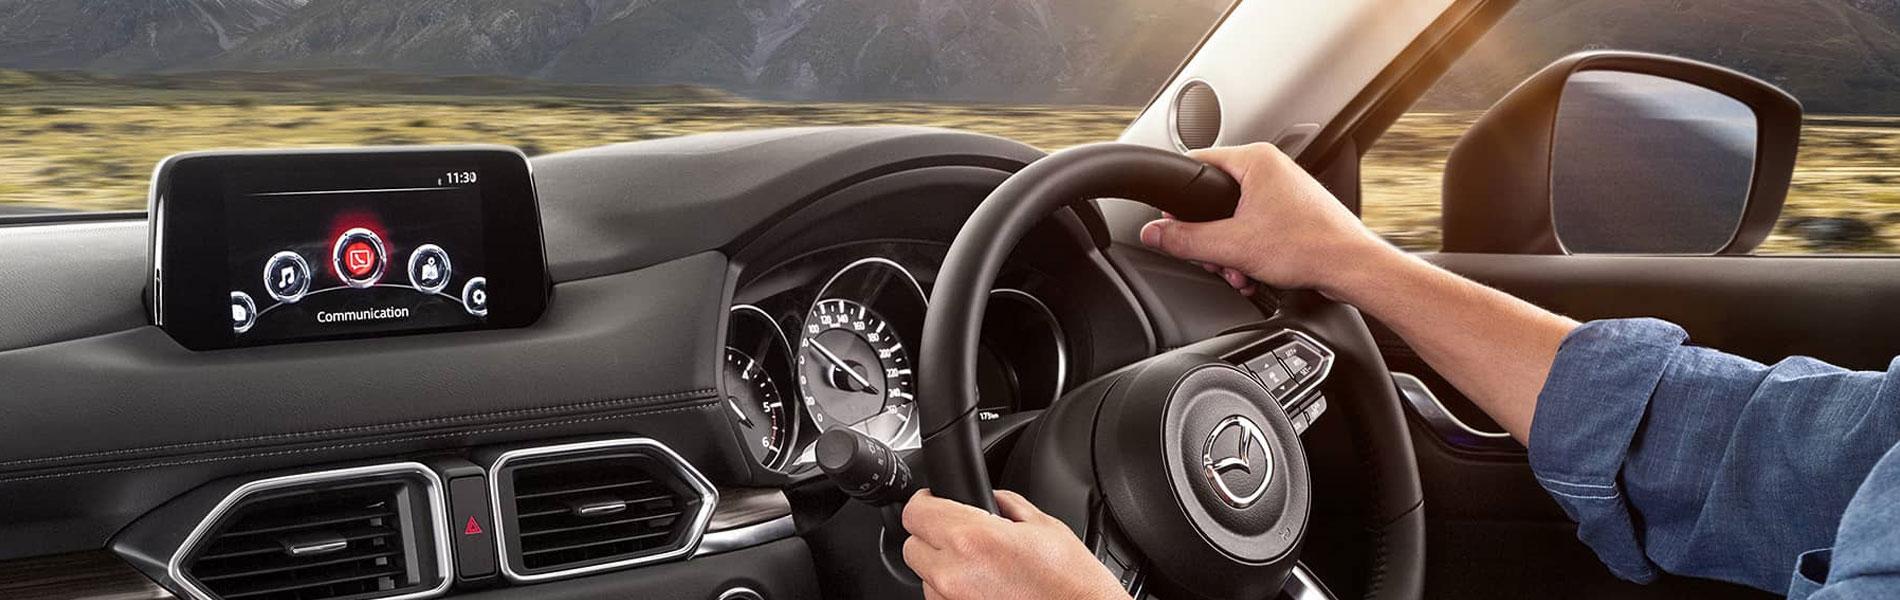 Mazda Next-Gen CX-5 Image 0